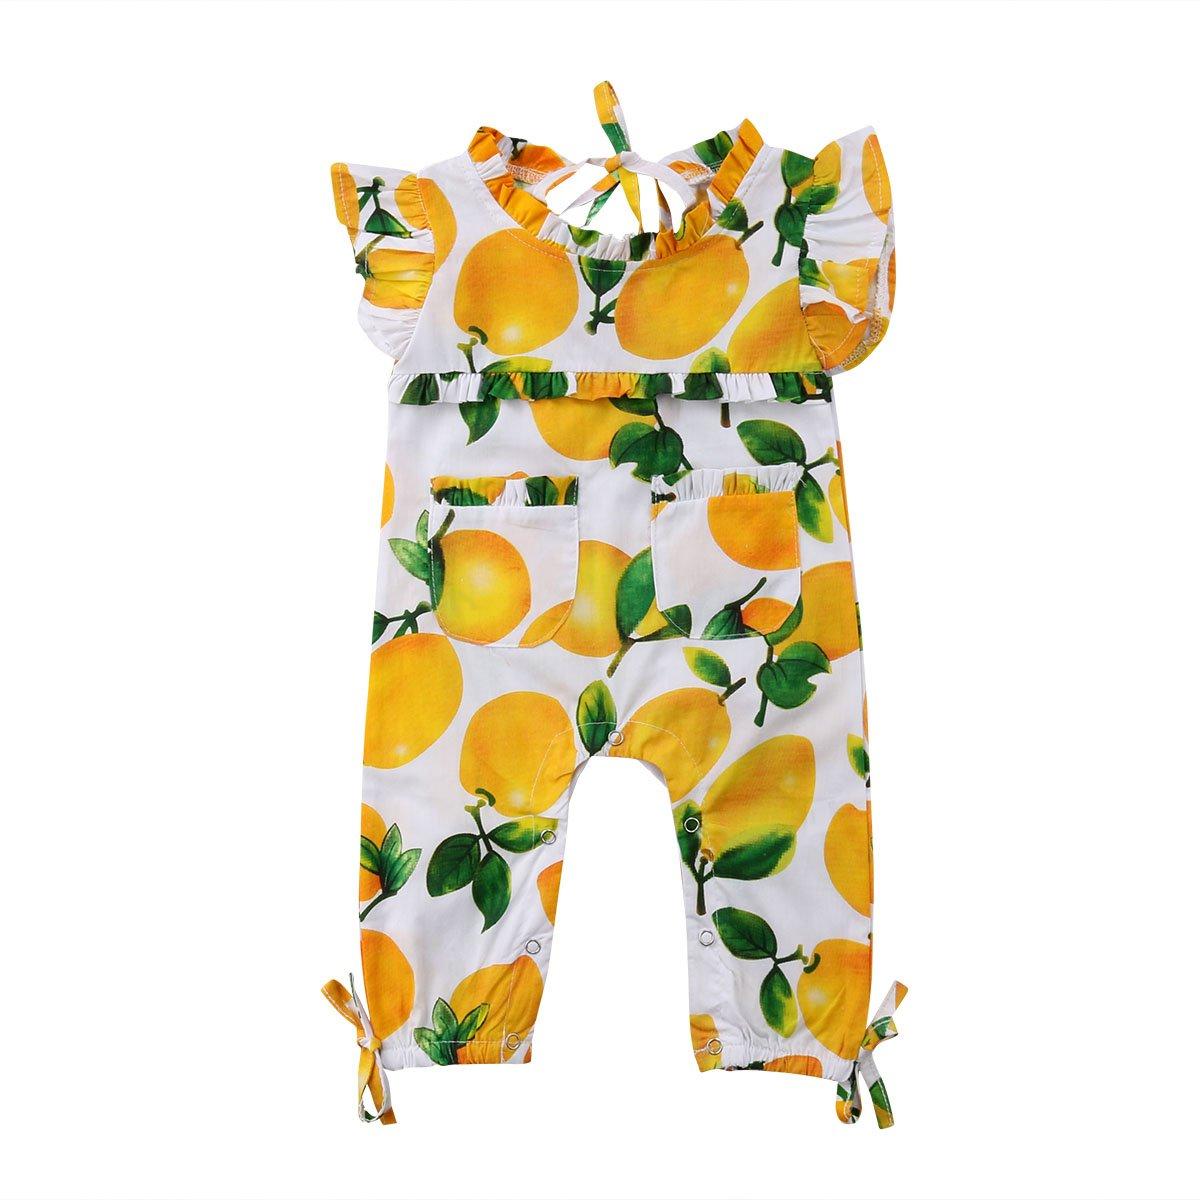 a27b643d8 Amazon.com  YAZAD Toddler Newborn Infant Baby Girls Lemon Floral ...